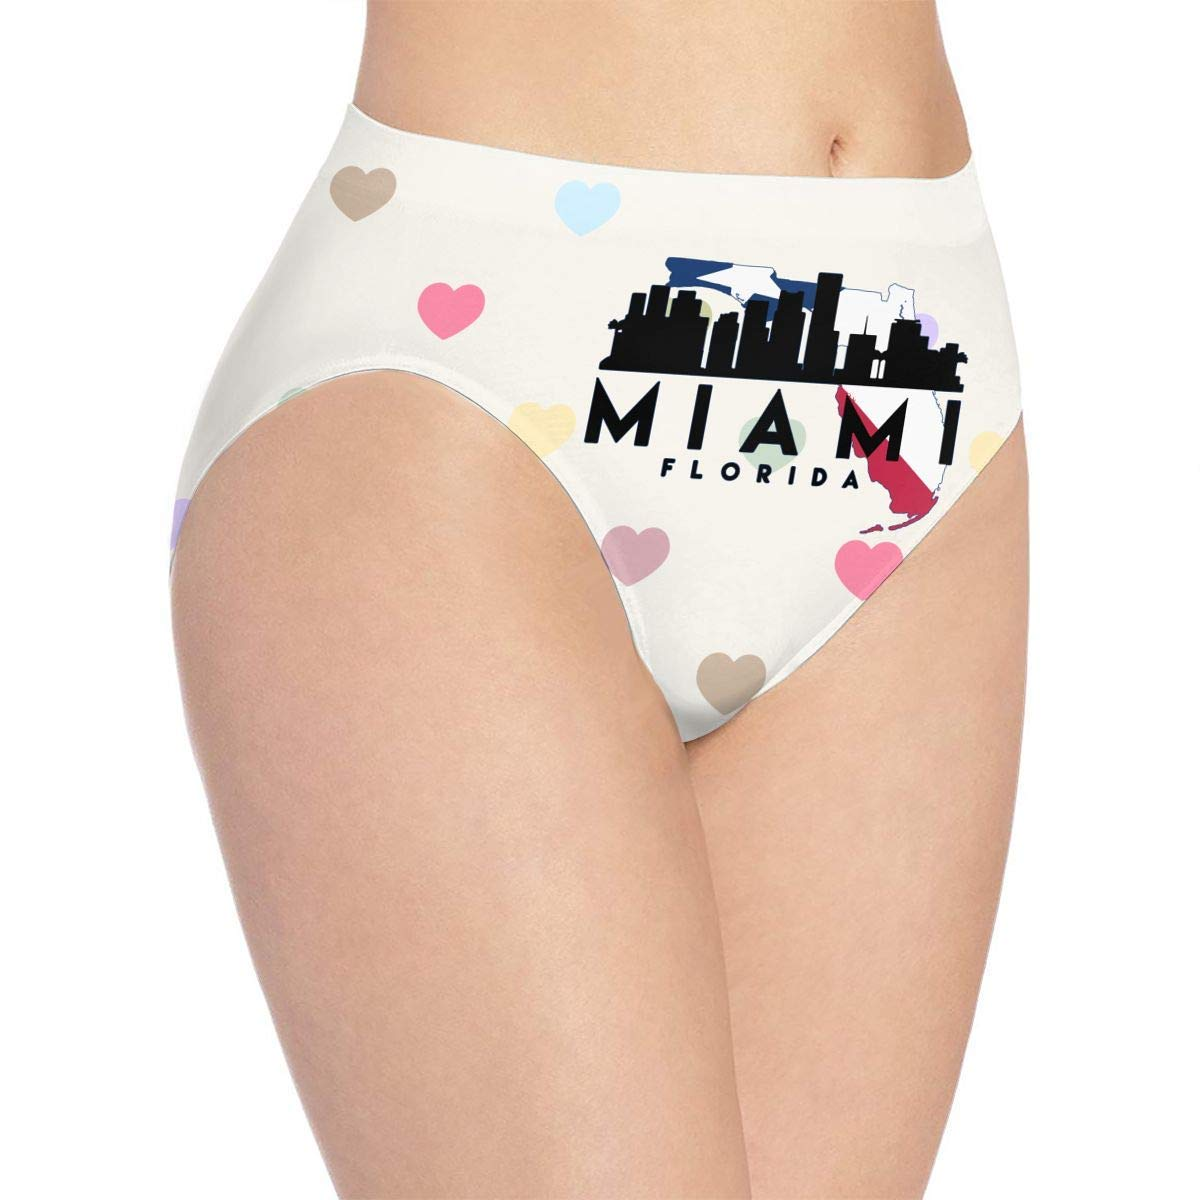 0681864a21c Amazon.com  Youth Girls Cute Sexy Miami Florida Silhouette Skyline MAP  Women s Cotton Bikini Underwear Briefs Low-Waist White  Clothing